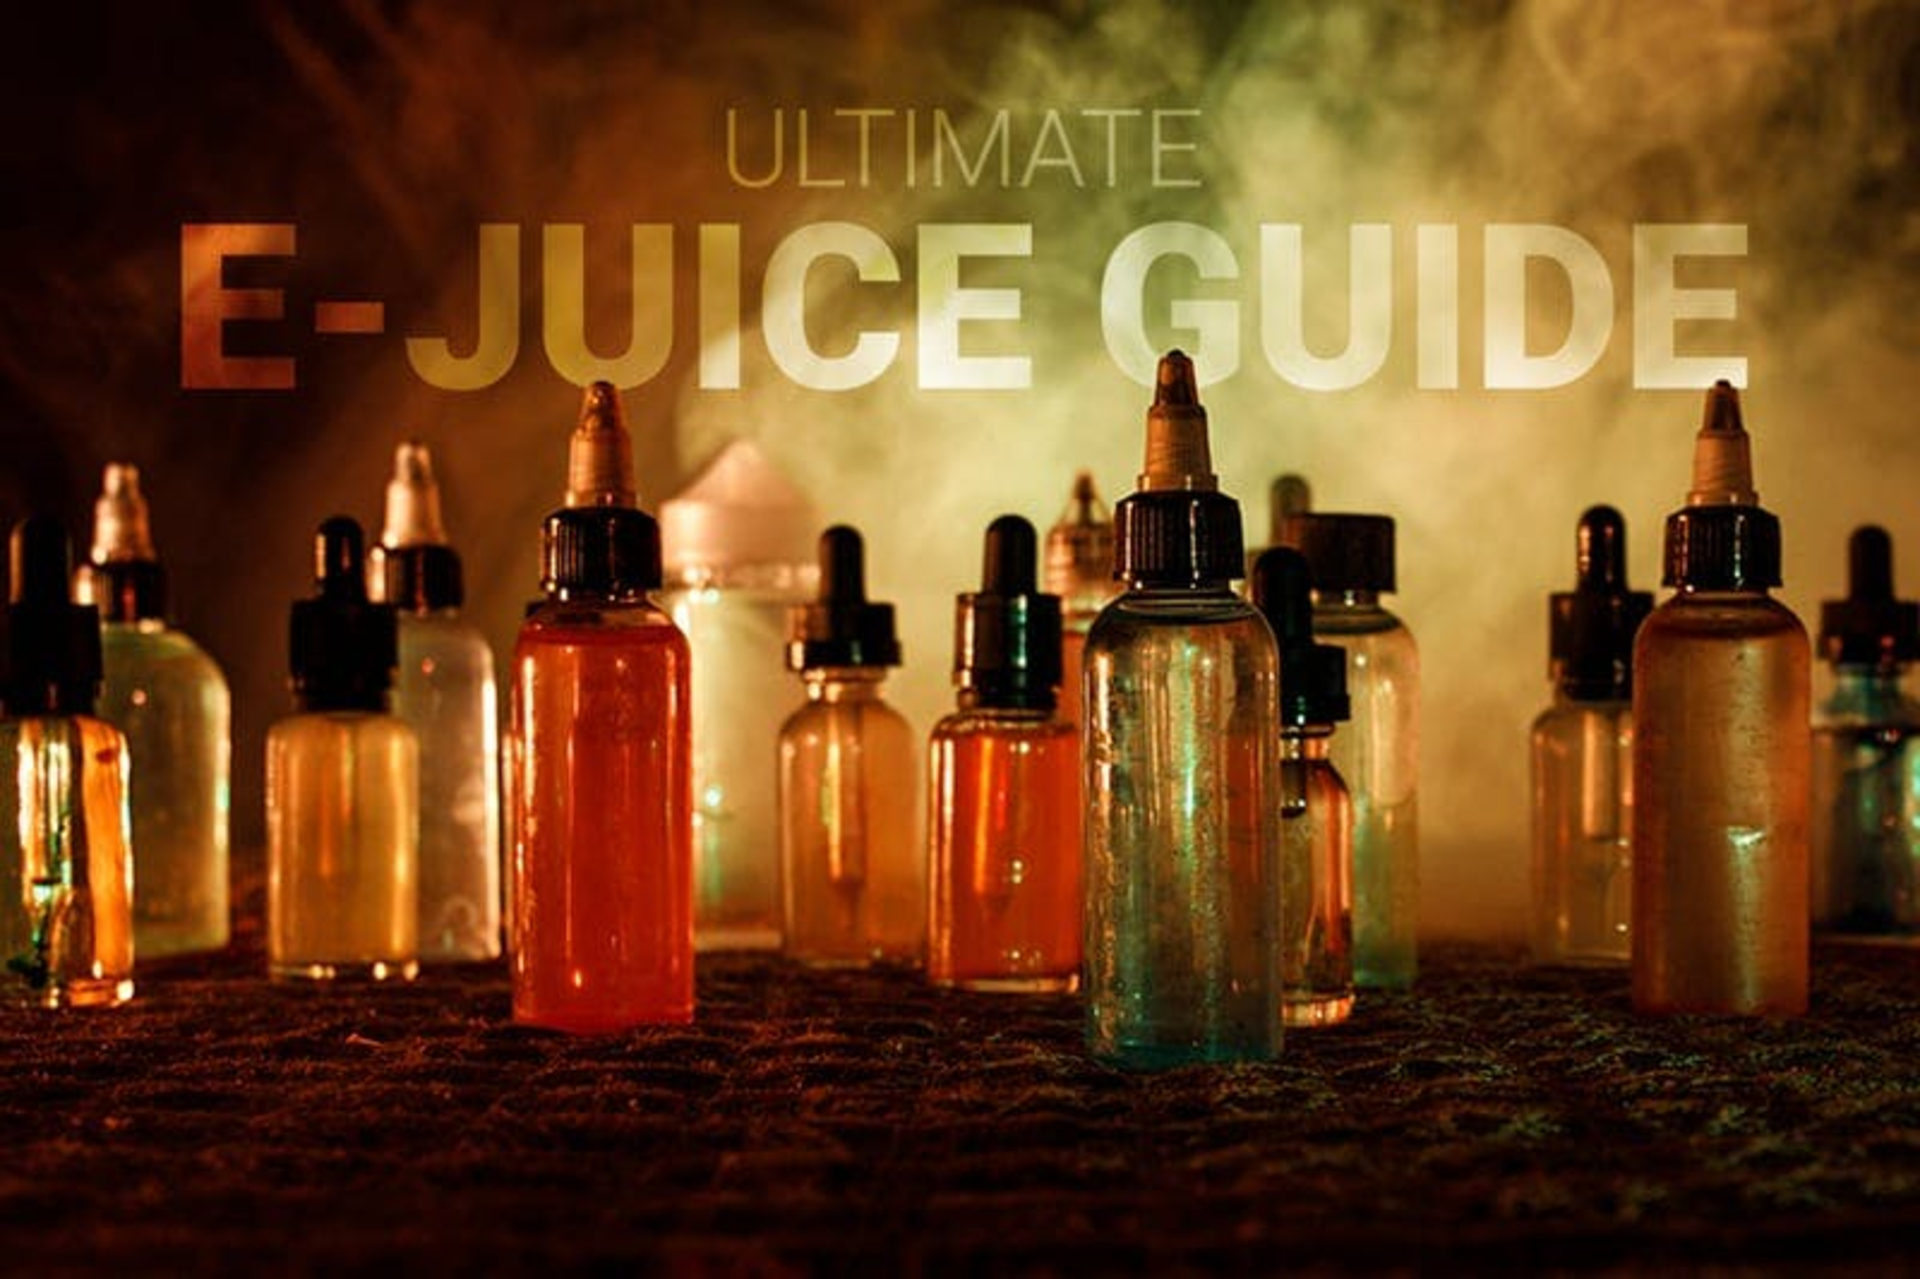 Zoom The World - e-juice-guide-thumbnail